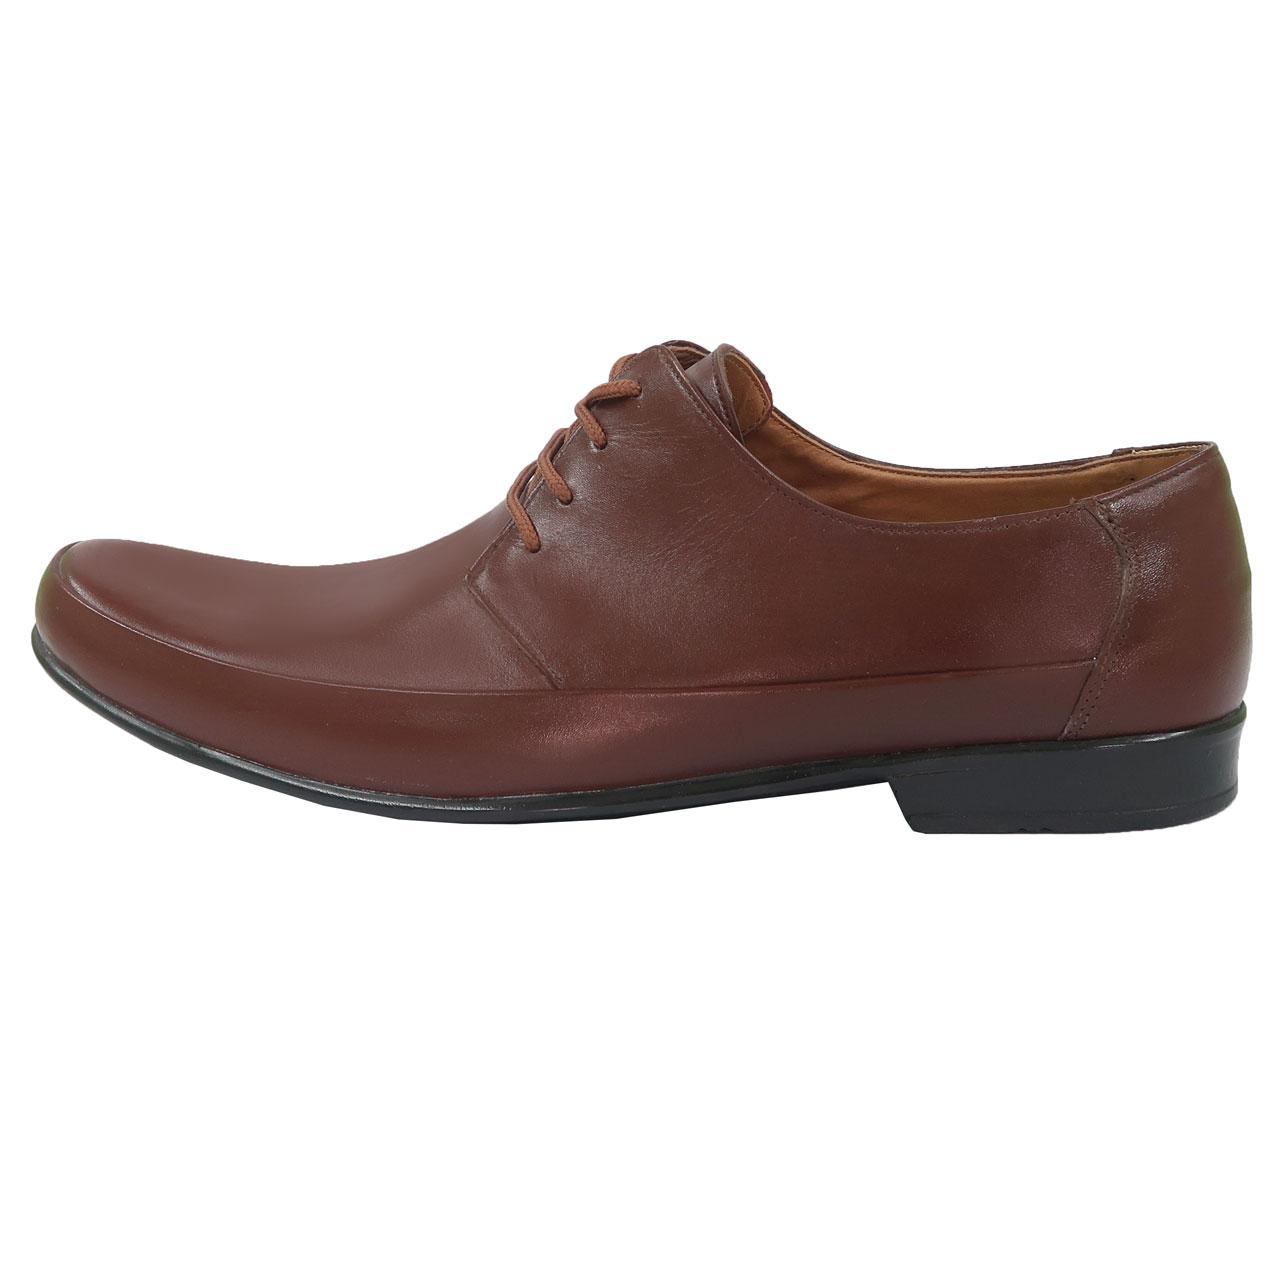 کفش مردانه مدل ریس